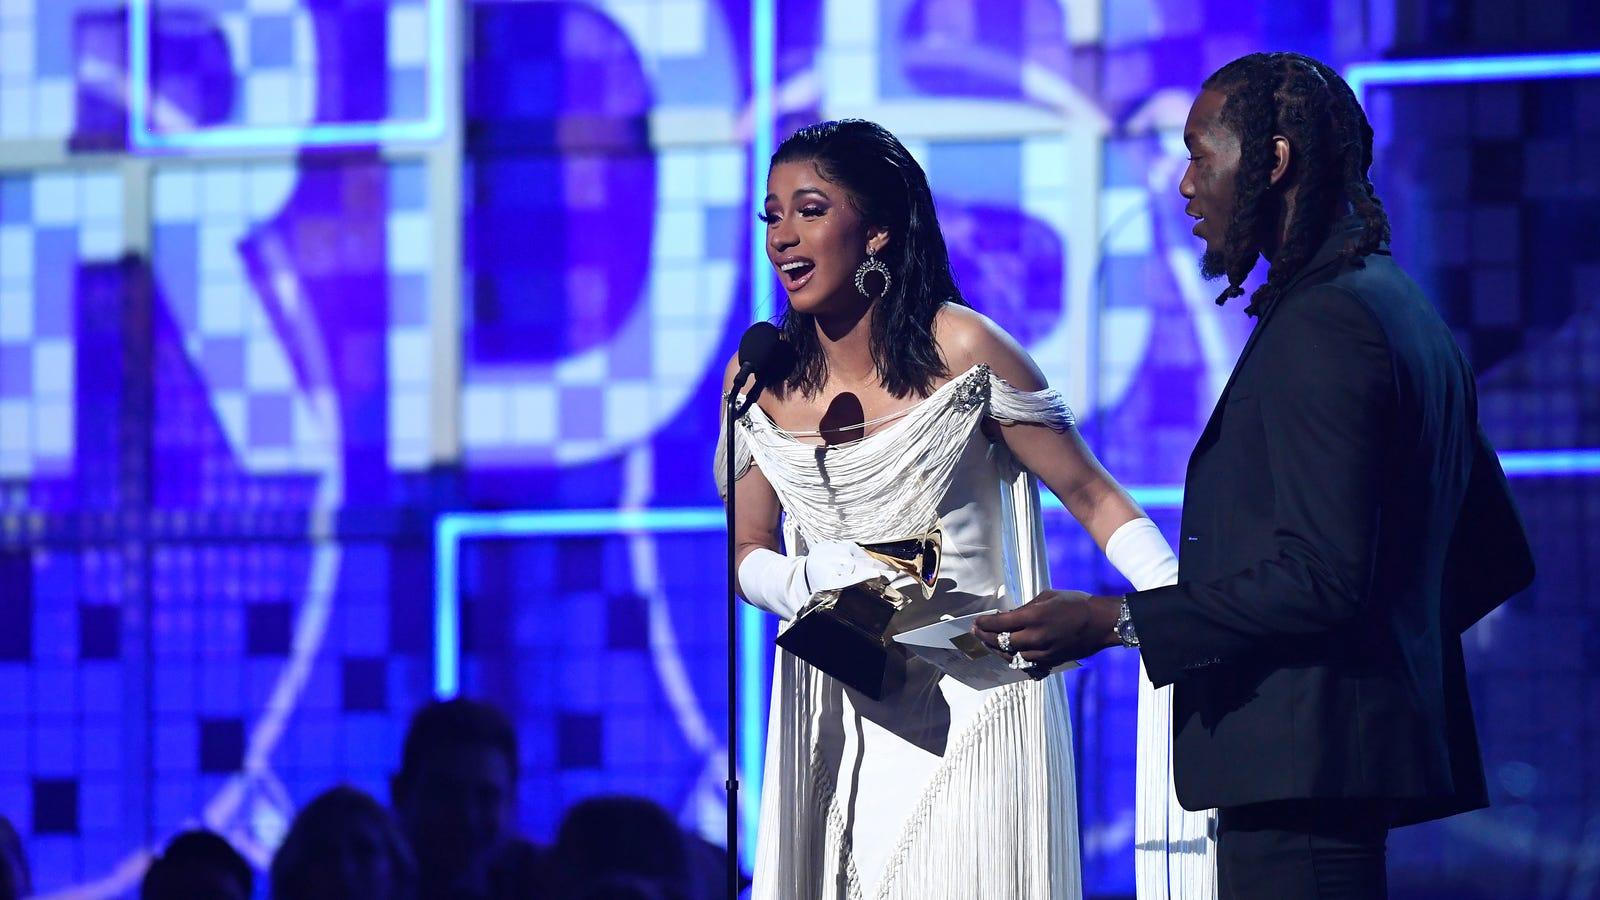 Grammy 2019 Cd: Recap Of The 2019 Grammys